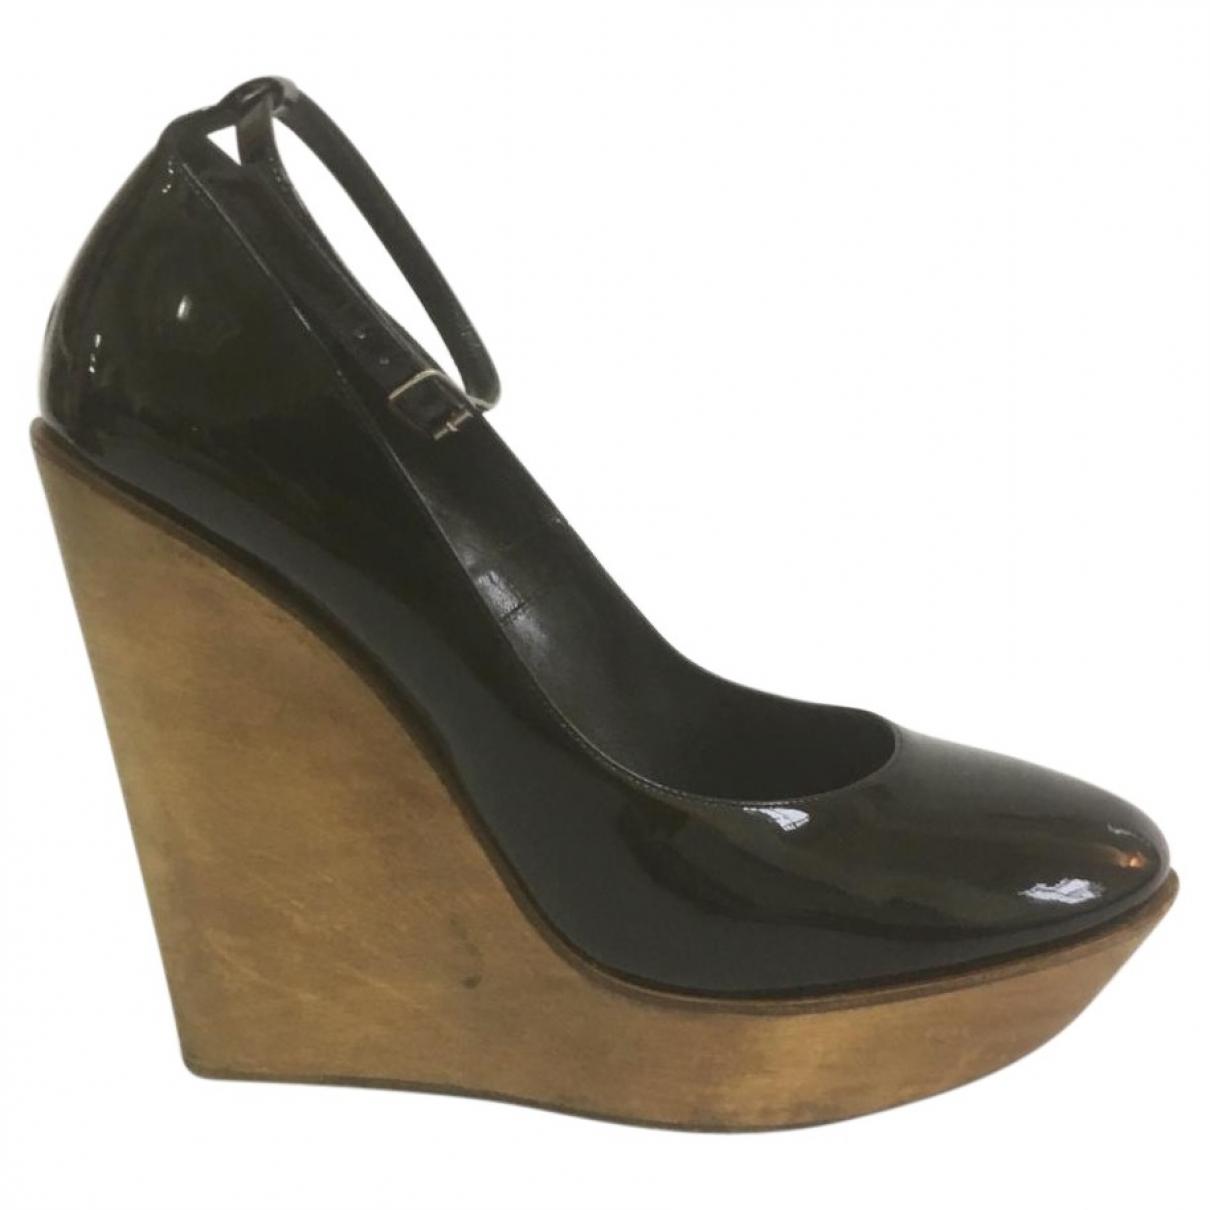 Chloé \N Black Patent leather Heels for Women 38 EU